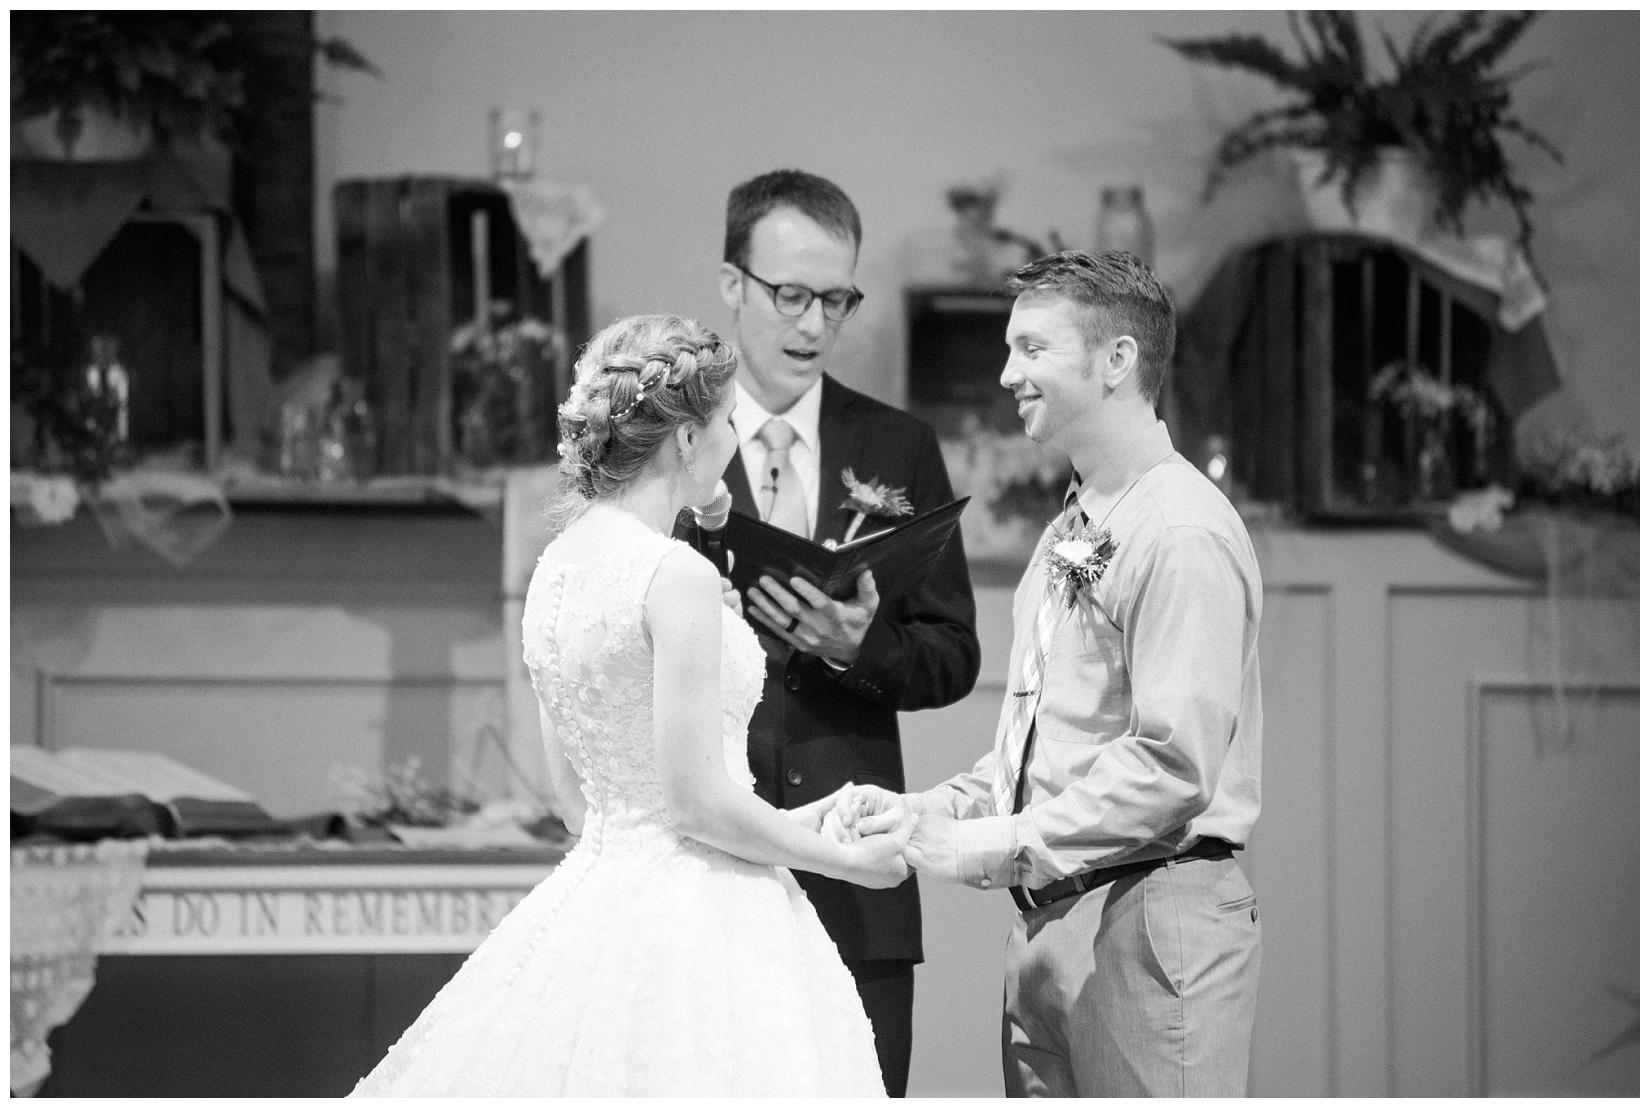 cat-alkire-wedding-photographer-indiana-chicago-indianapolis-fort-wayne_1316.jpg